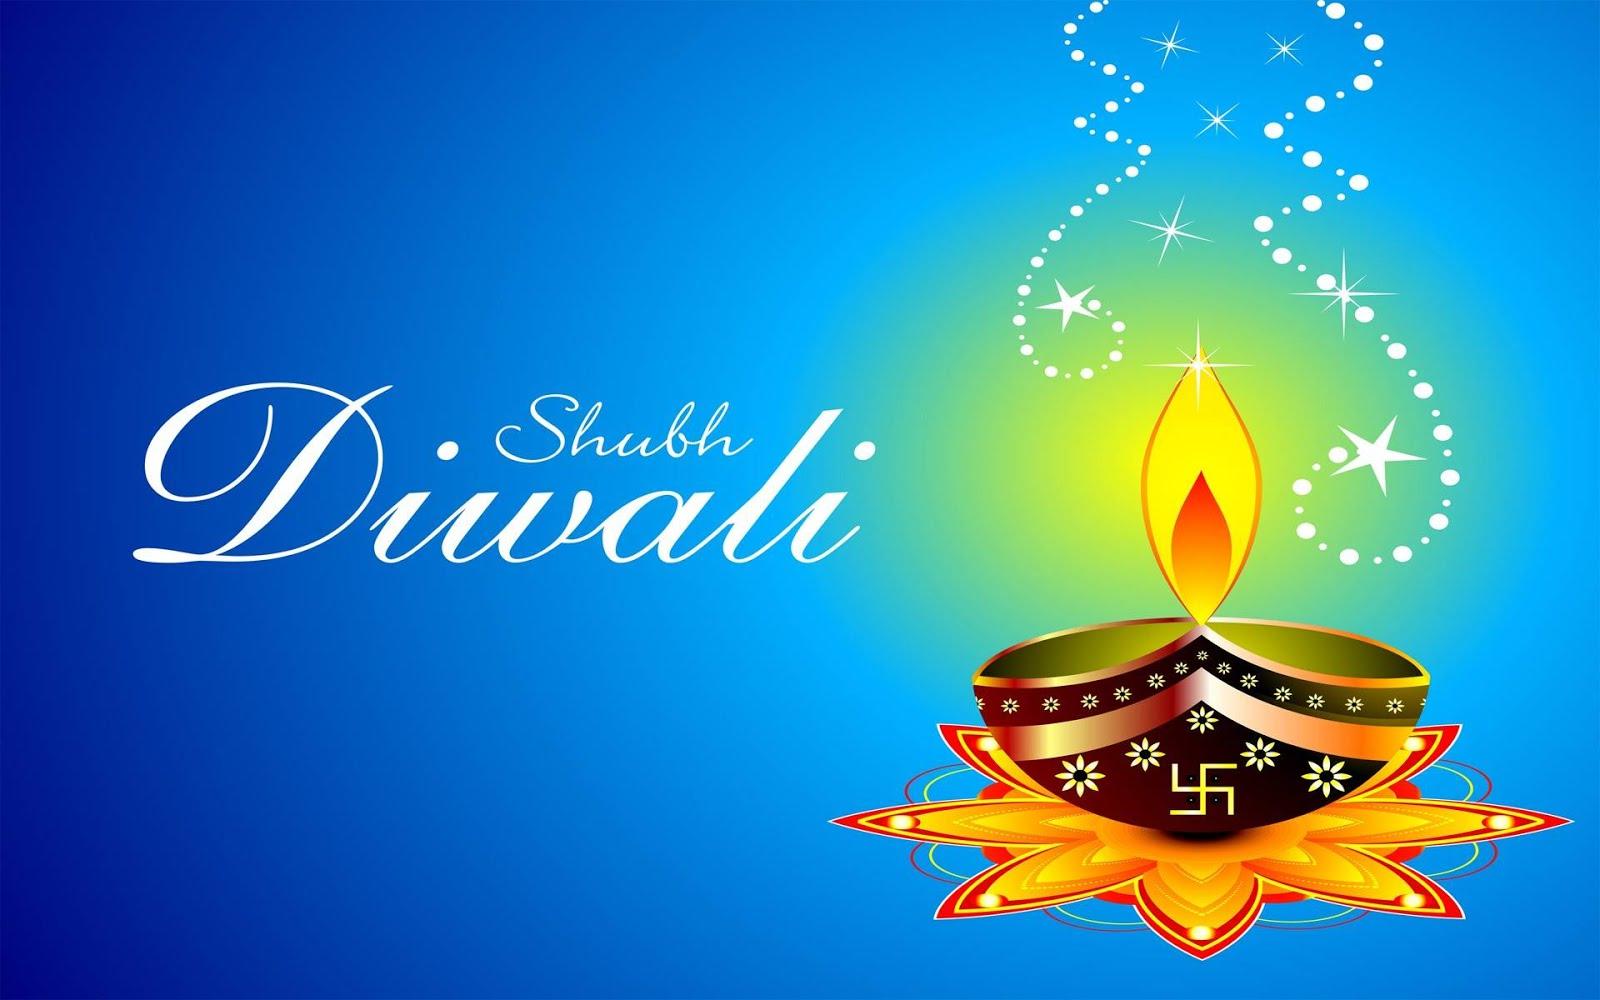 """happy diwali 2016 images downlaod"